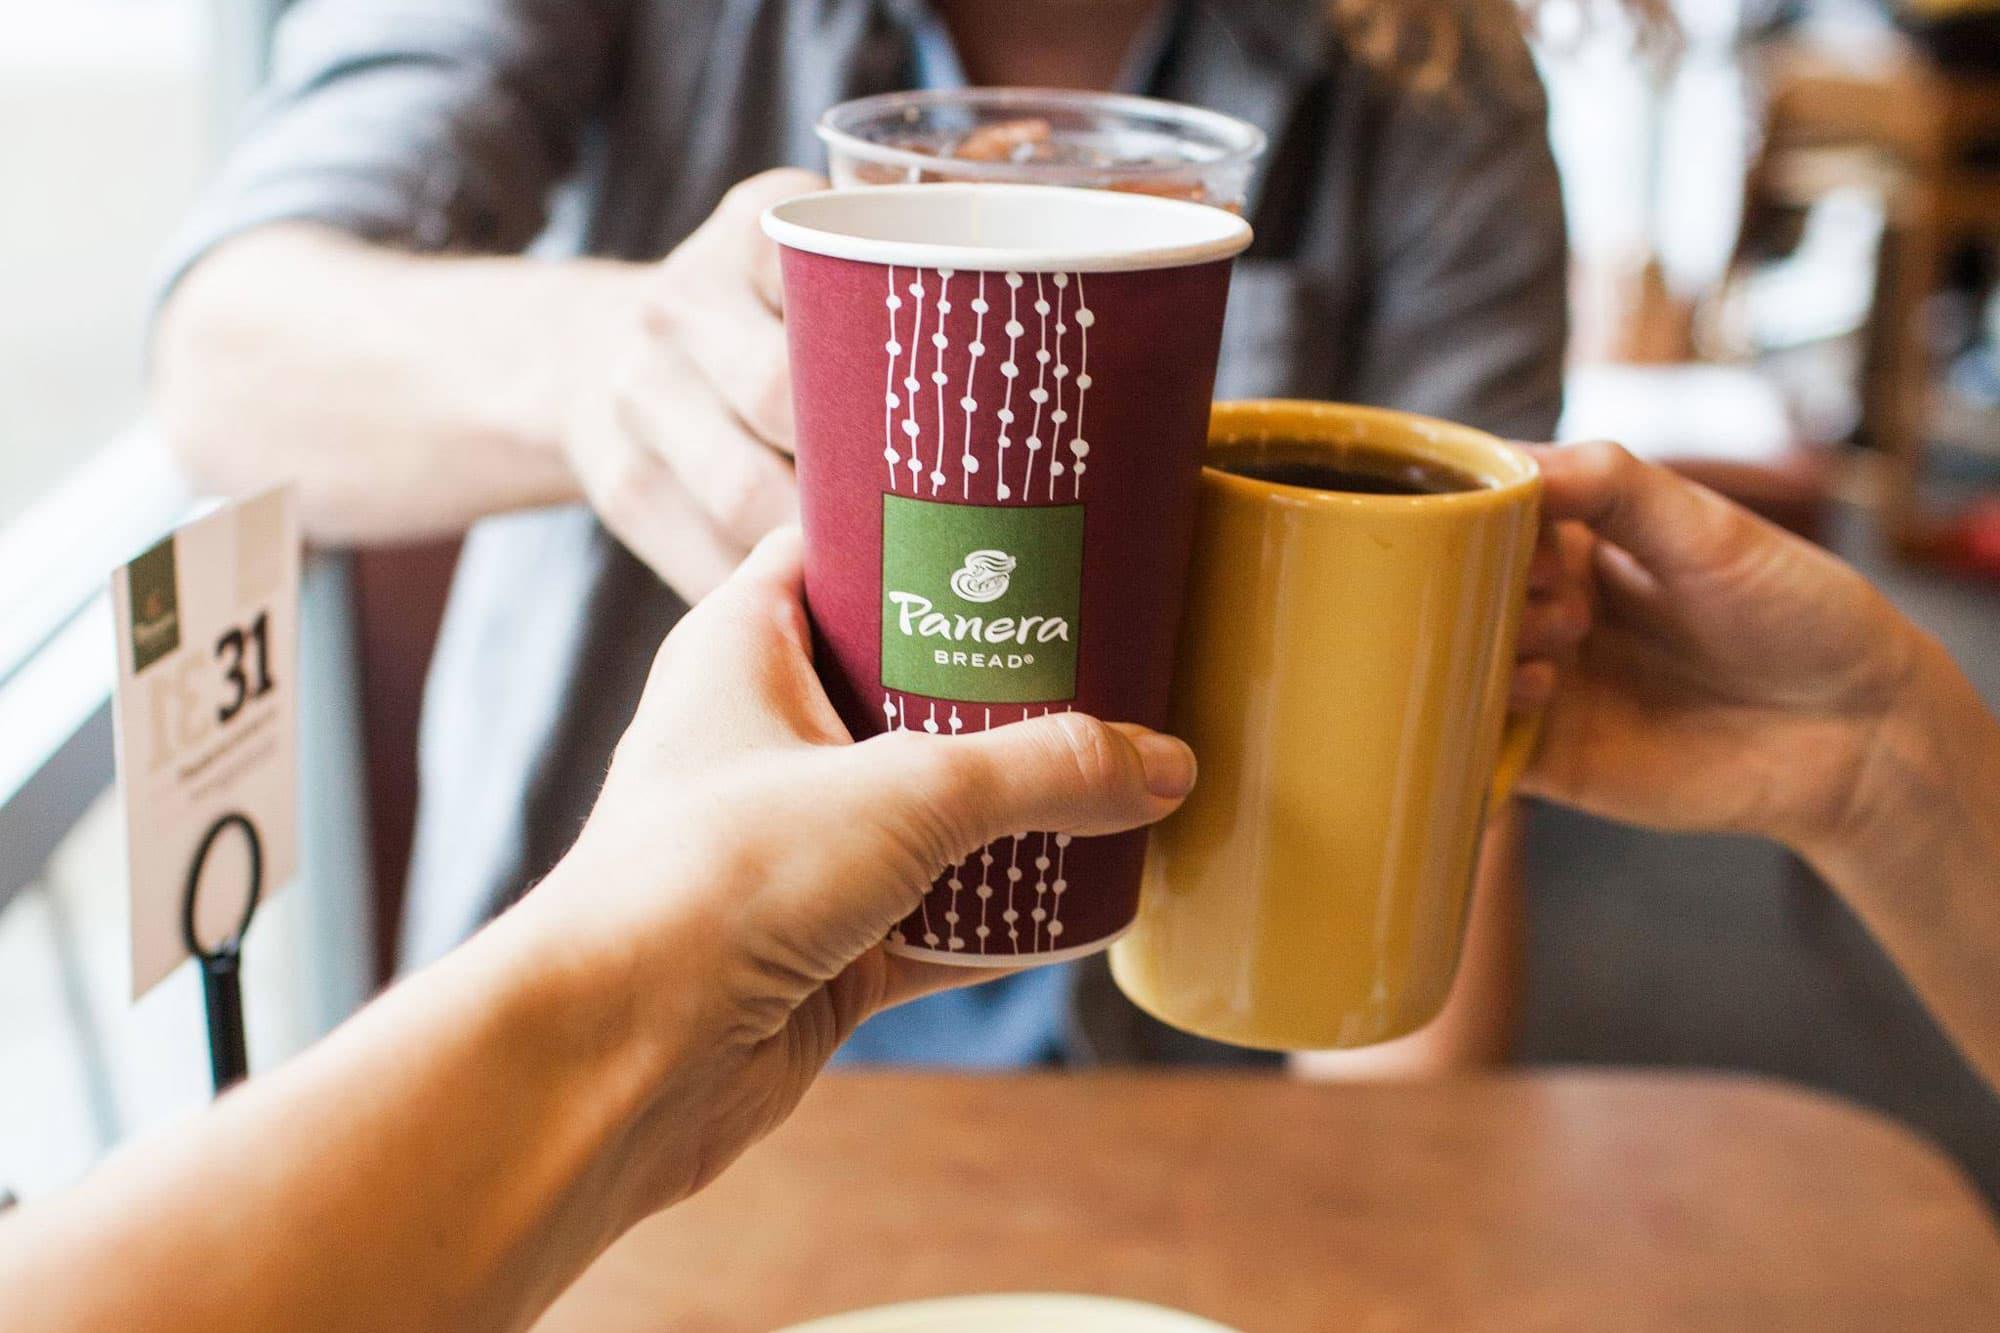 Starbucks vs. Panera: Who Makes the Best Pumpkin Spice Latte